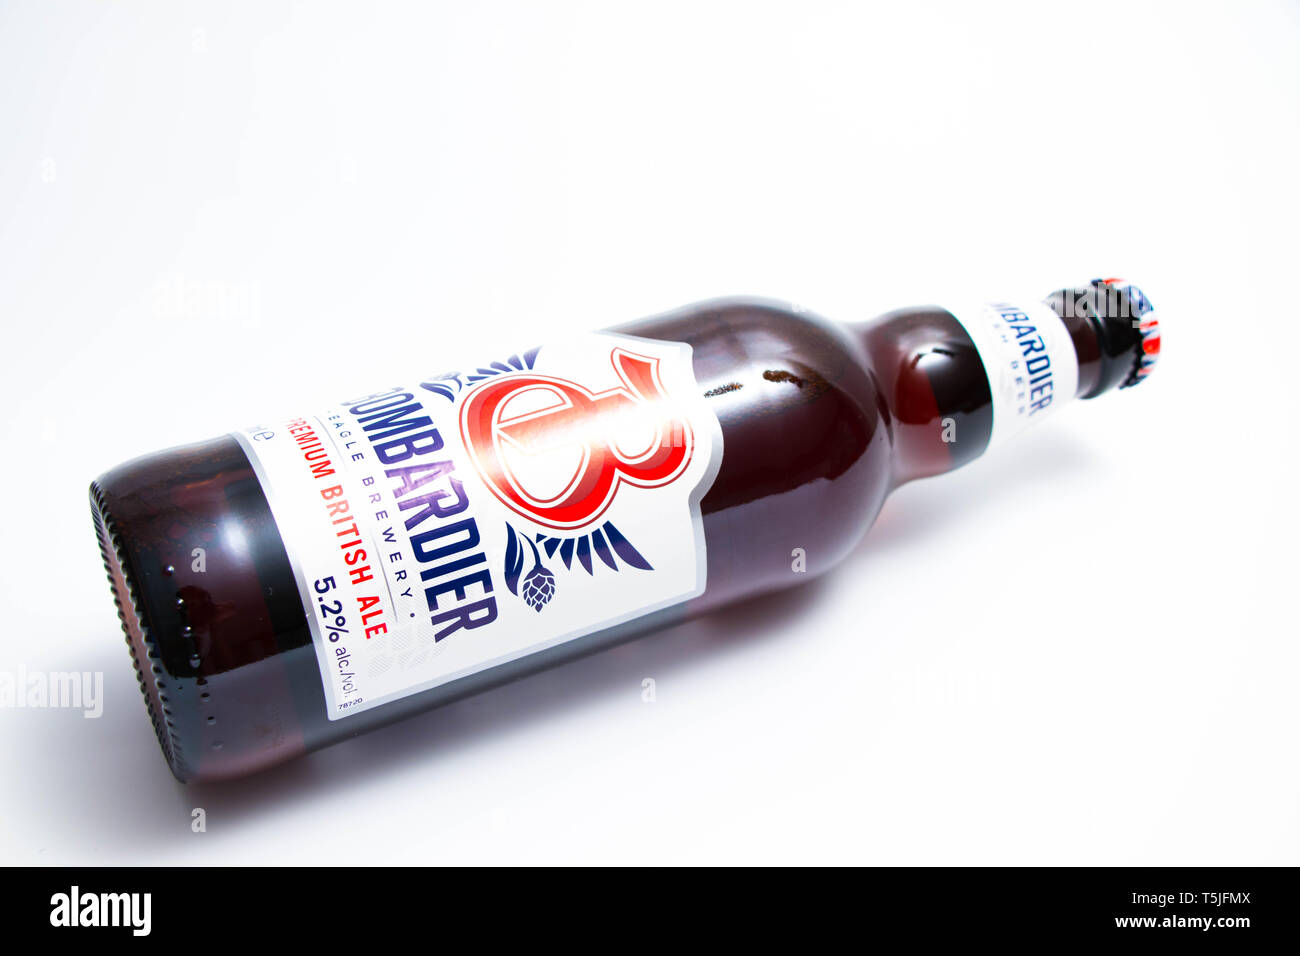 Bombardier British  ale Beer bottle from UK england - Stock Image